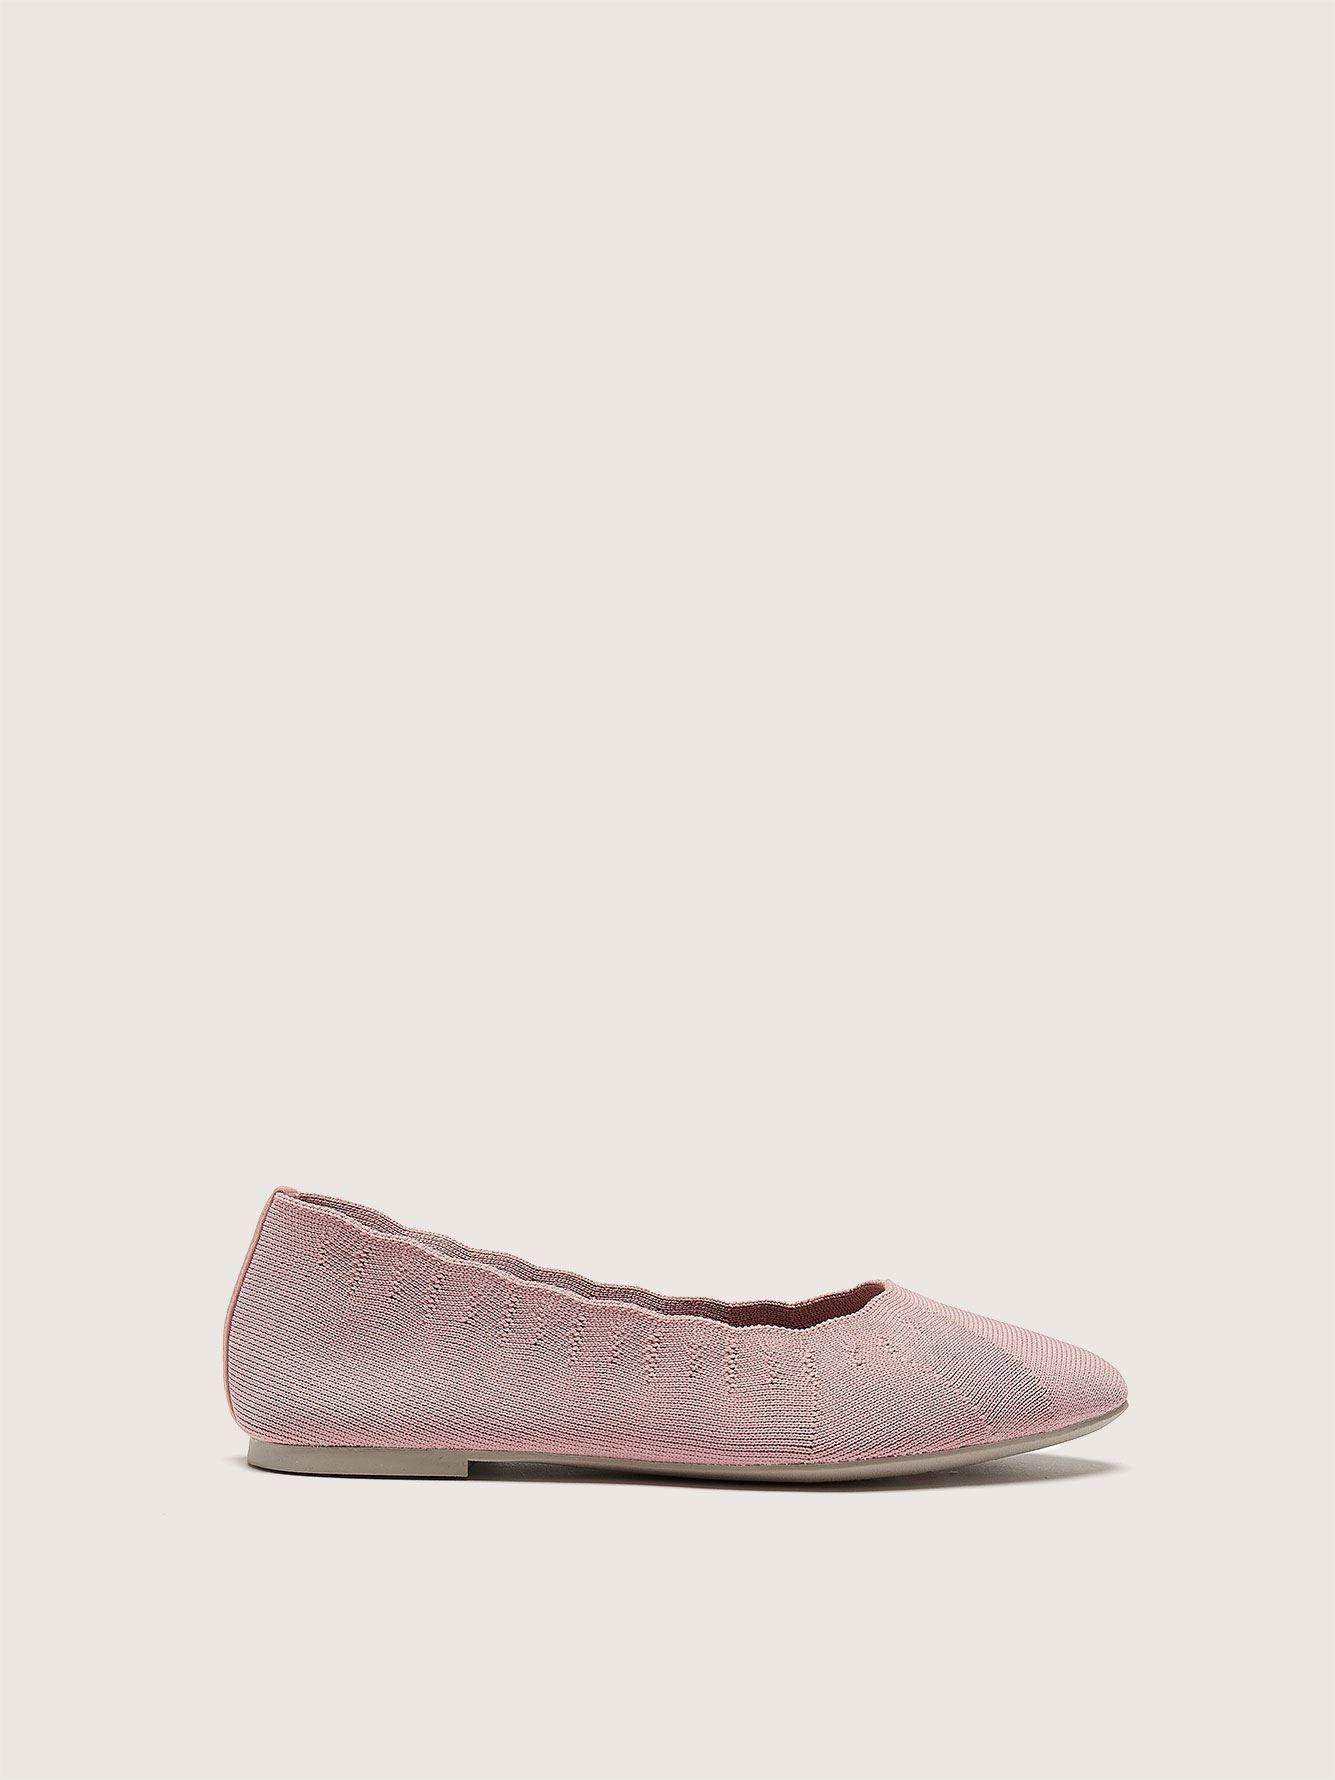 Wide Width Cleo Ballerina Flat